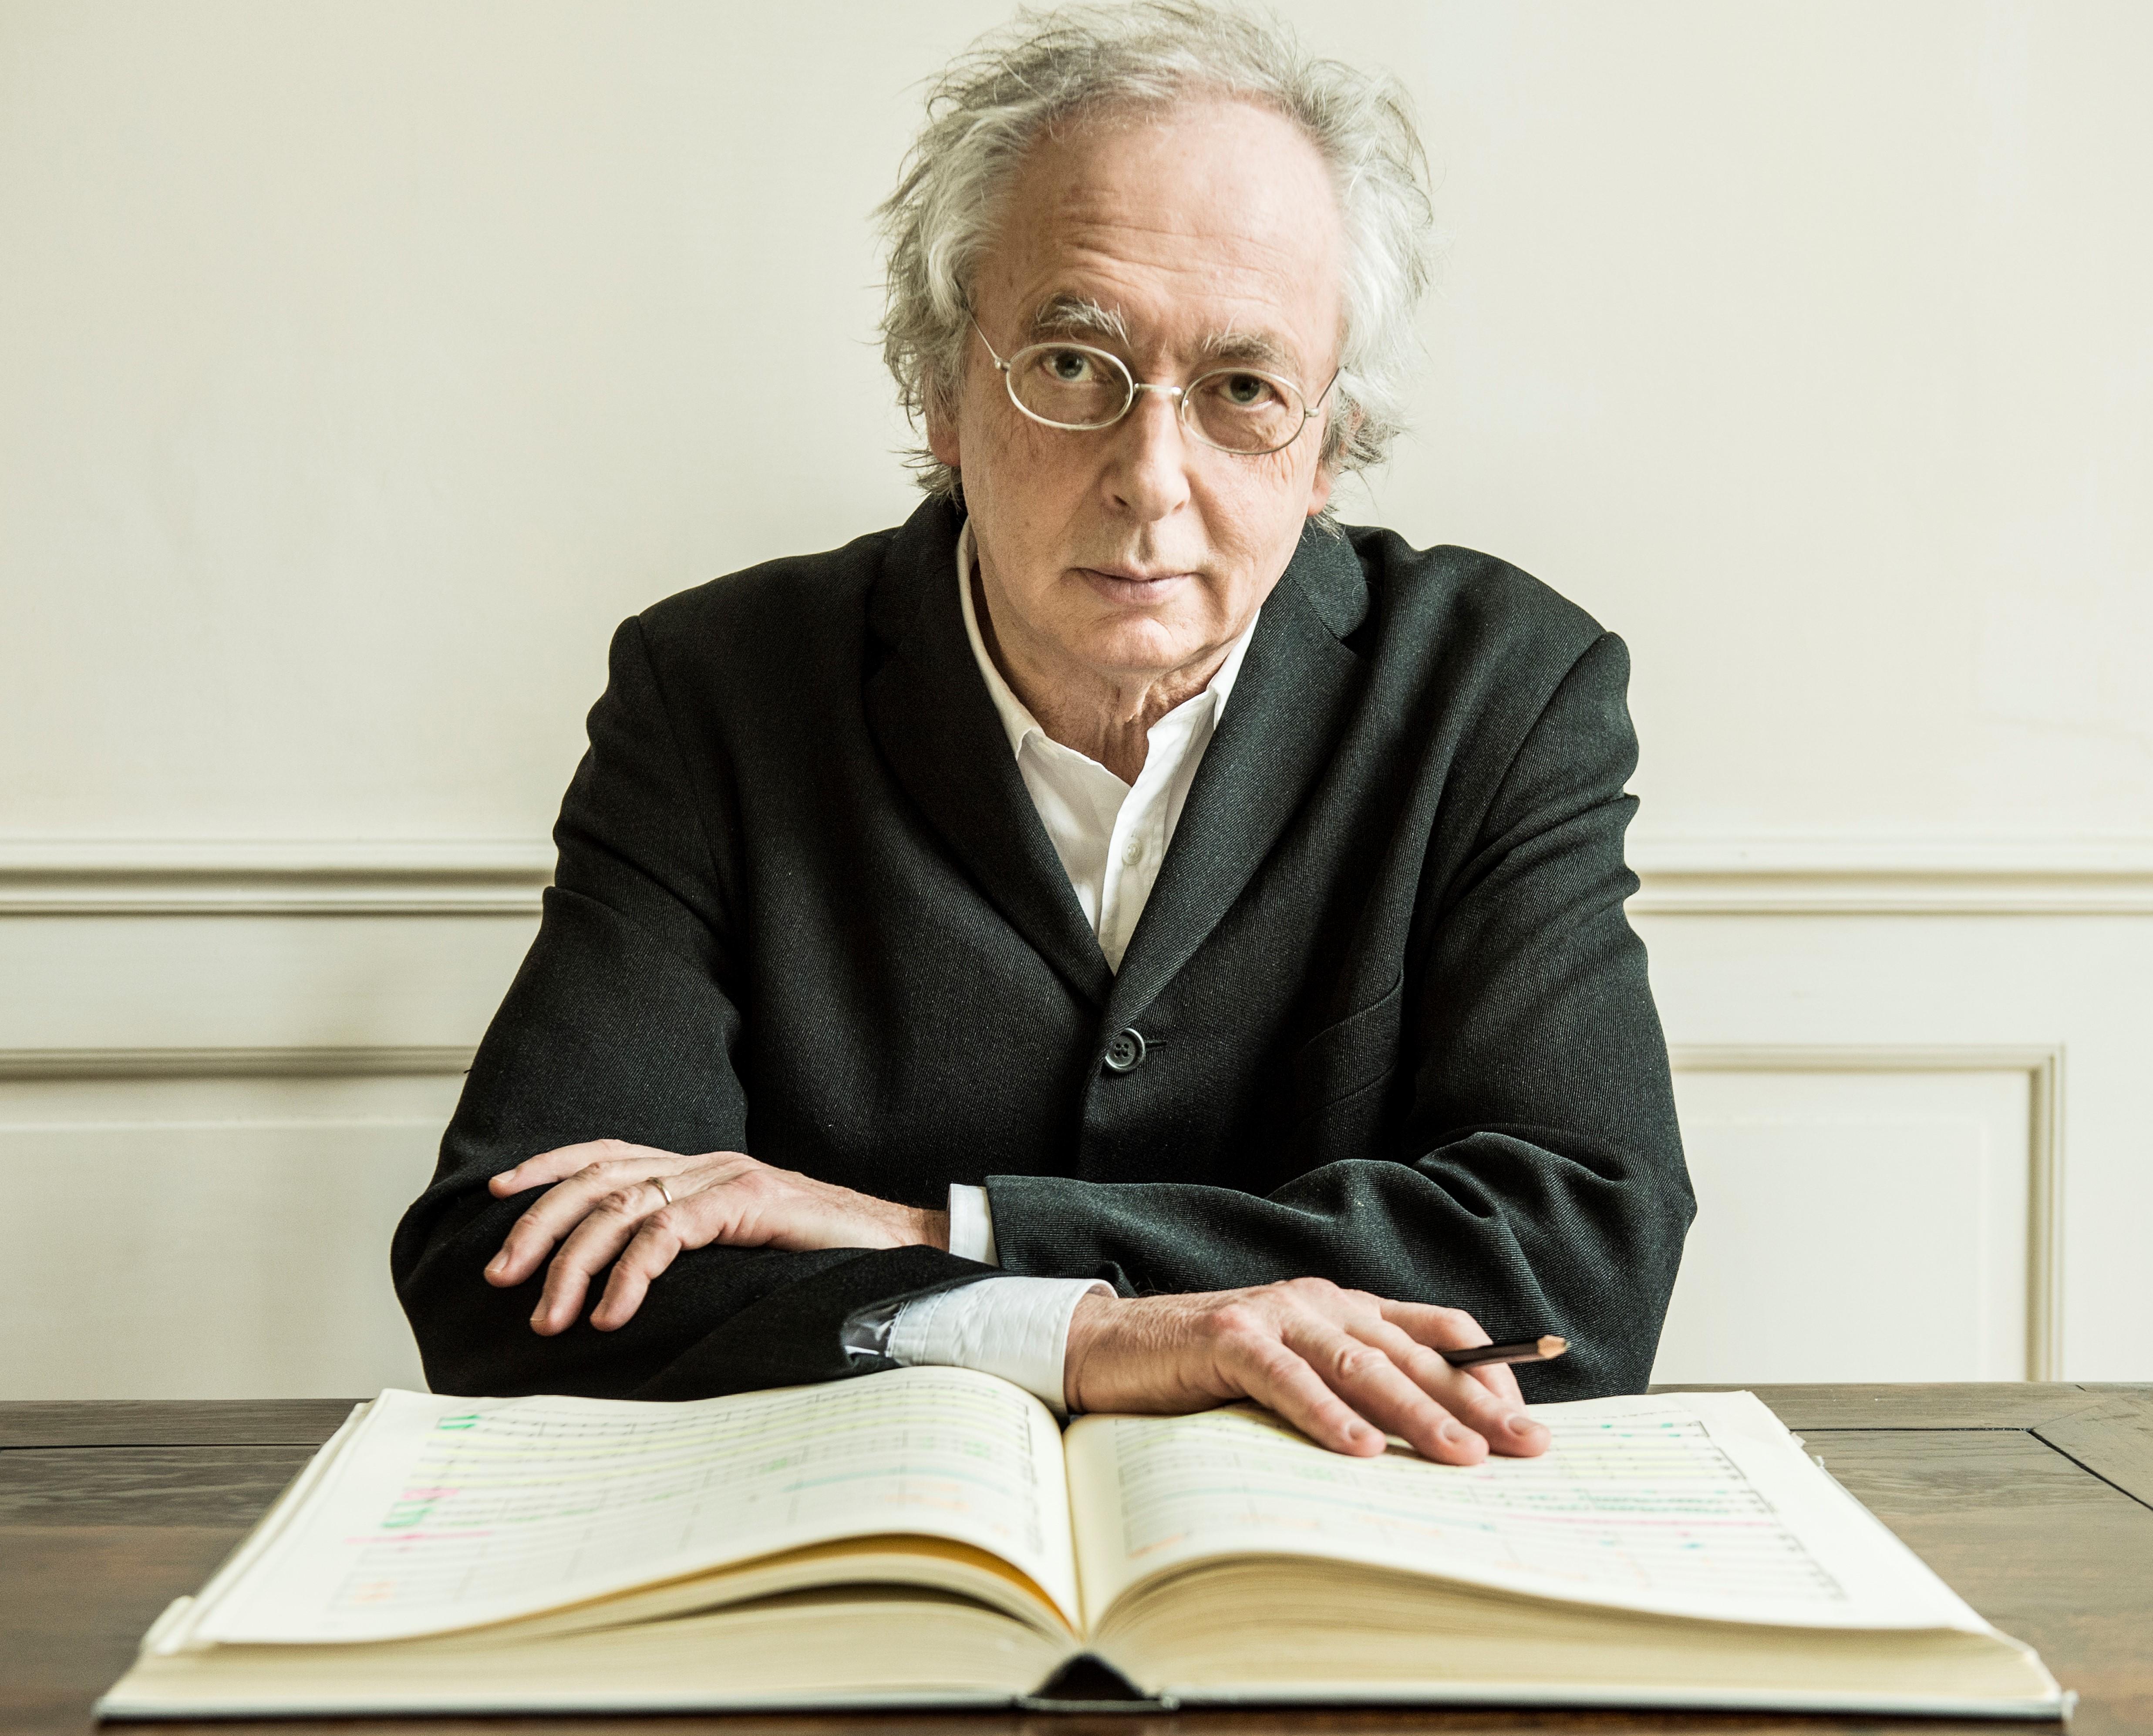 Caption: Conductor Philippe Herreweghe